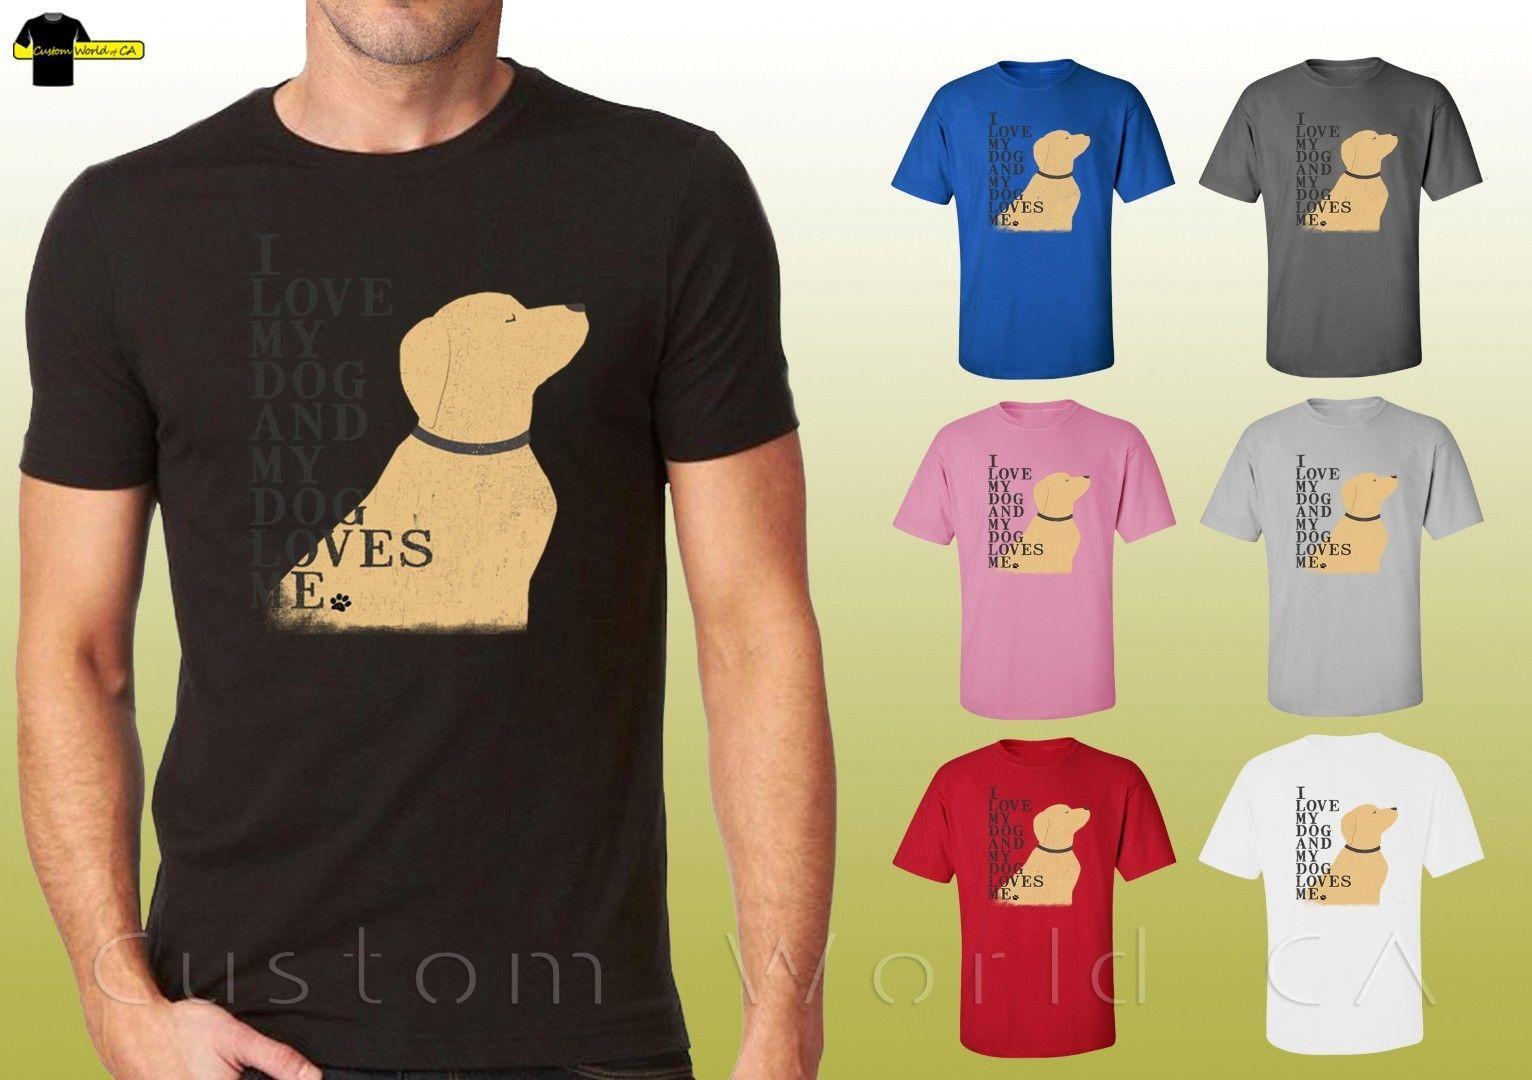 b249fe3e1e68 Dog Design Shirts I Love My Dog Loves Me Graphic Puppy Unisex T Shirt  20085hl Cartoon T Shirt Men Unisex New Buy Shirt Ti Shirt From Cls6688522,  ...